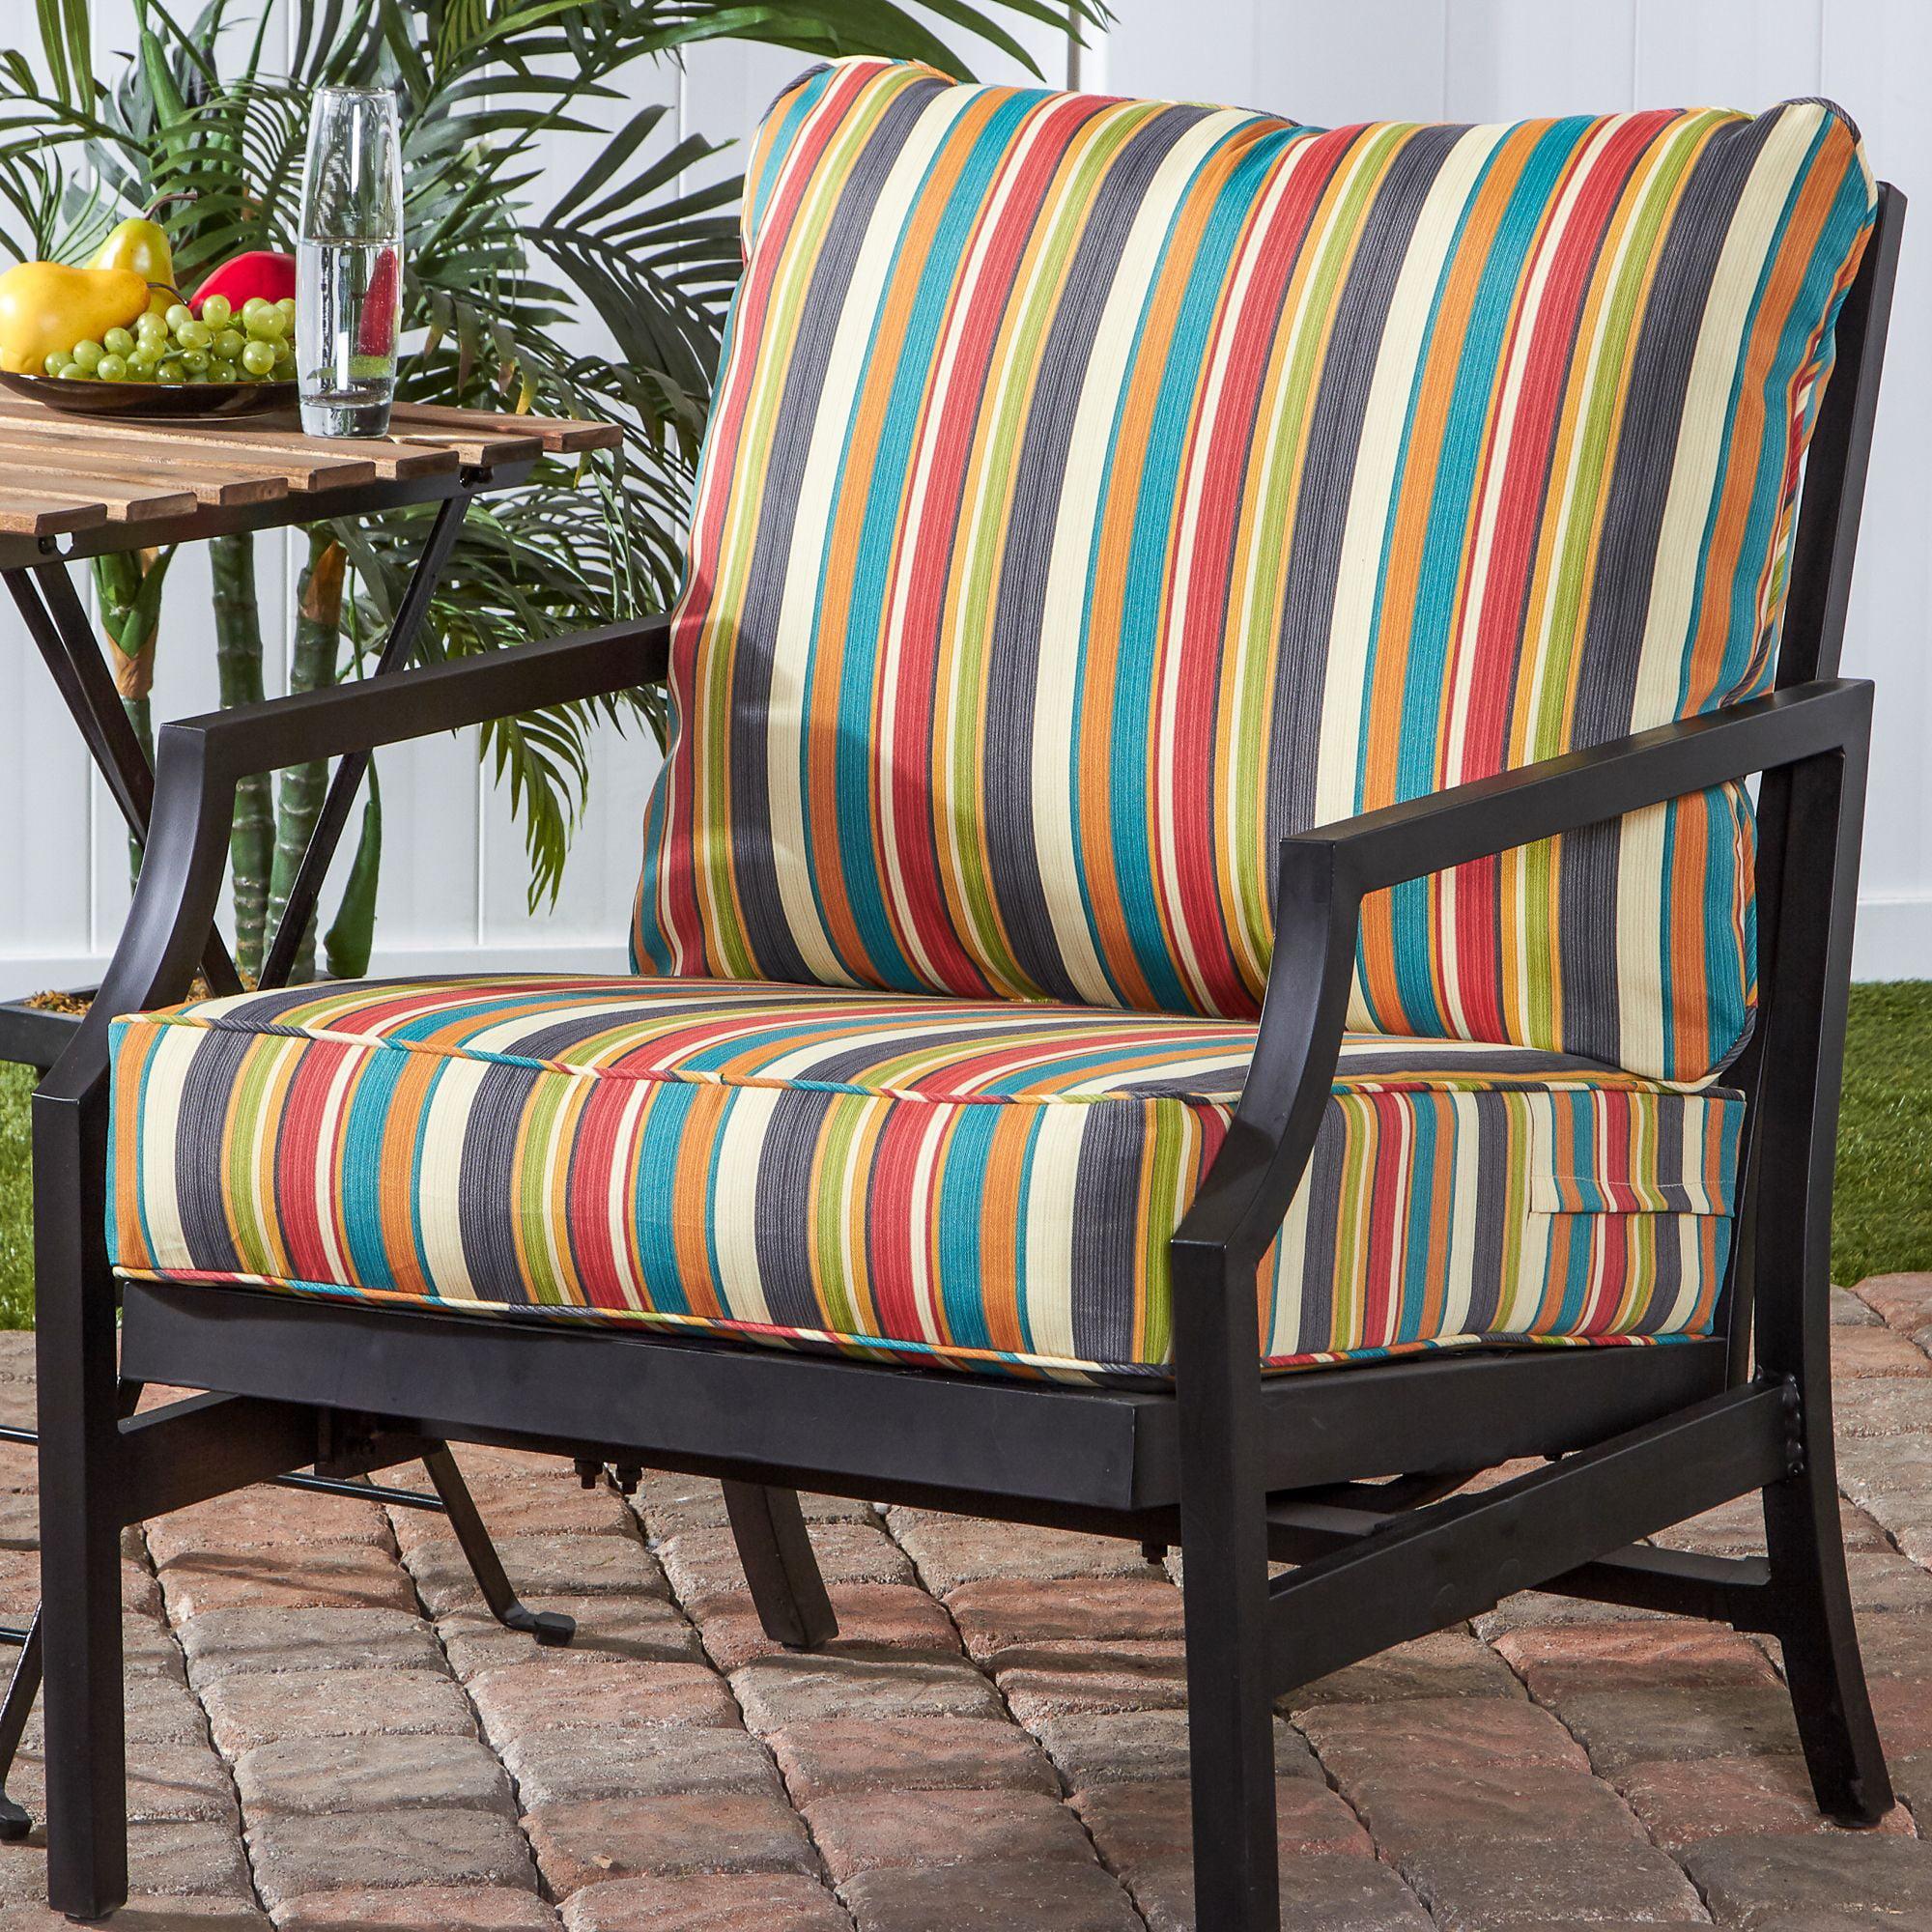 Greendale Home Fashions Sunset Outdoor Deep Seat Cushion Set